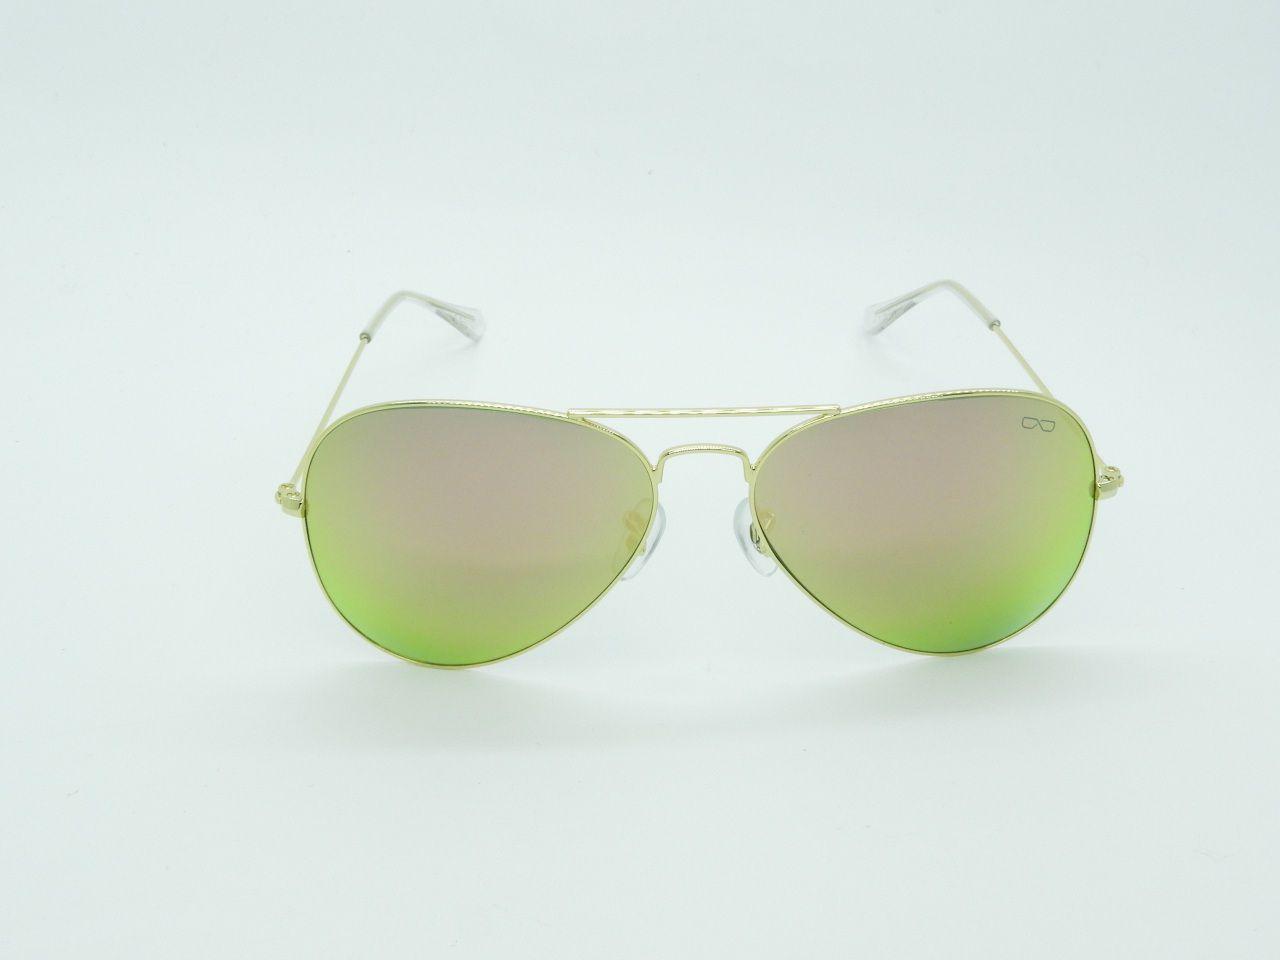 Óculos de Sol Feminino 3025 Rosa Espelhado 58